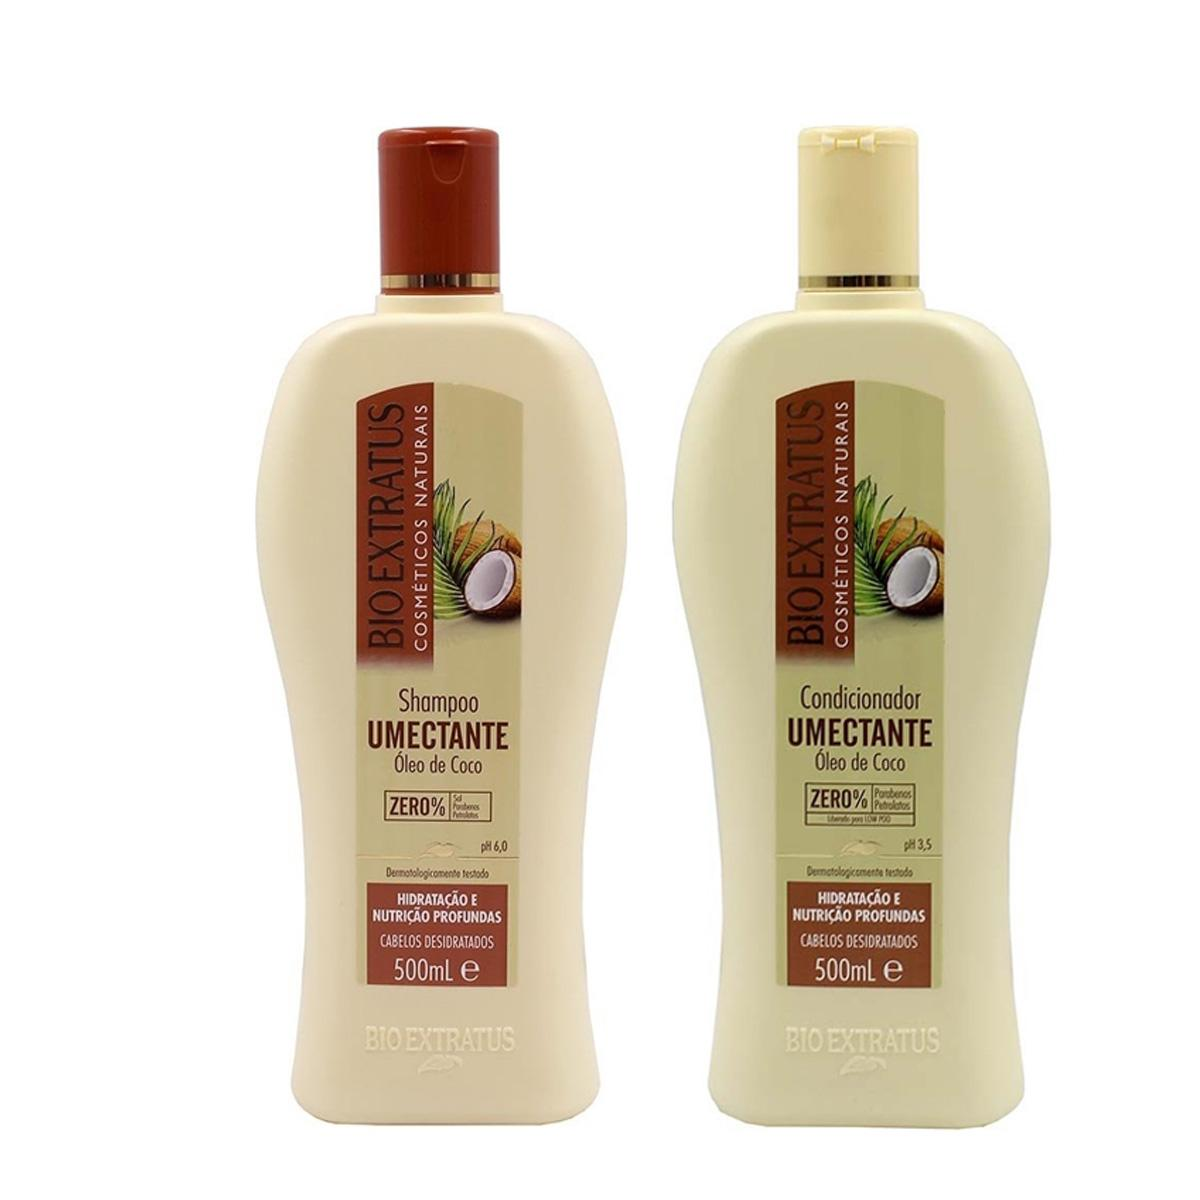 Kit Bio Extratus Umectante Shampoo 500ml e Cond. 500ml